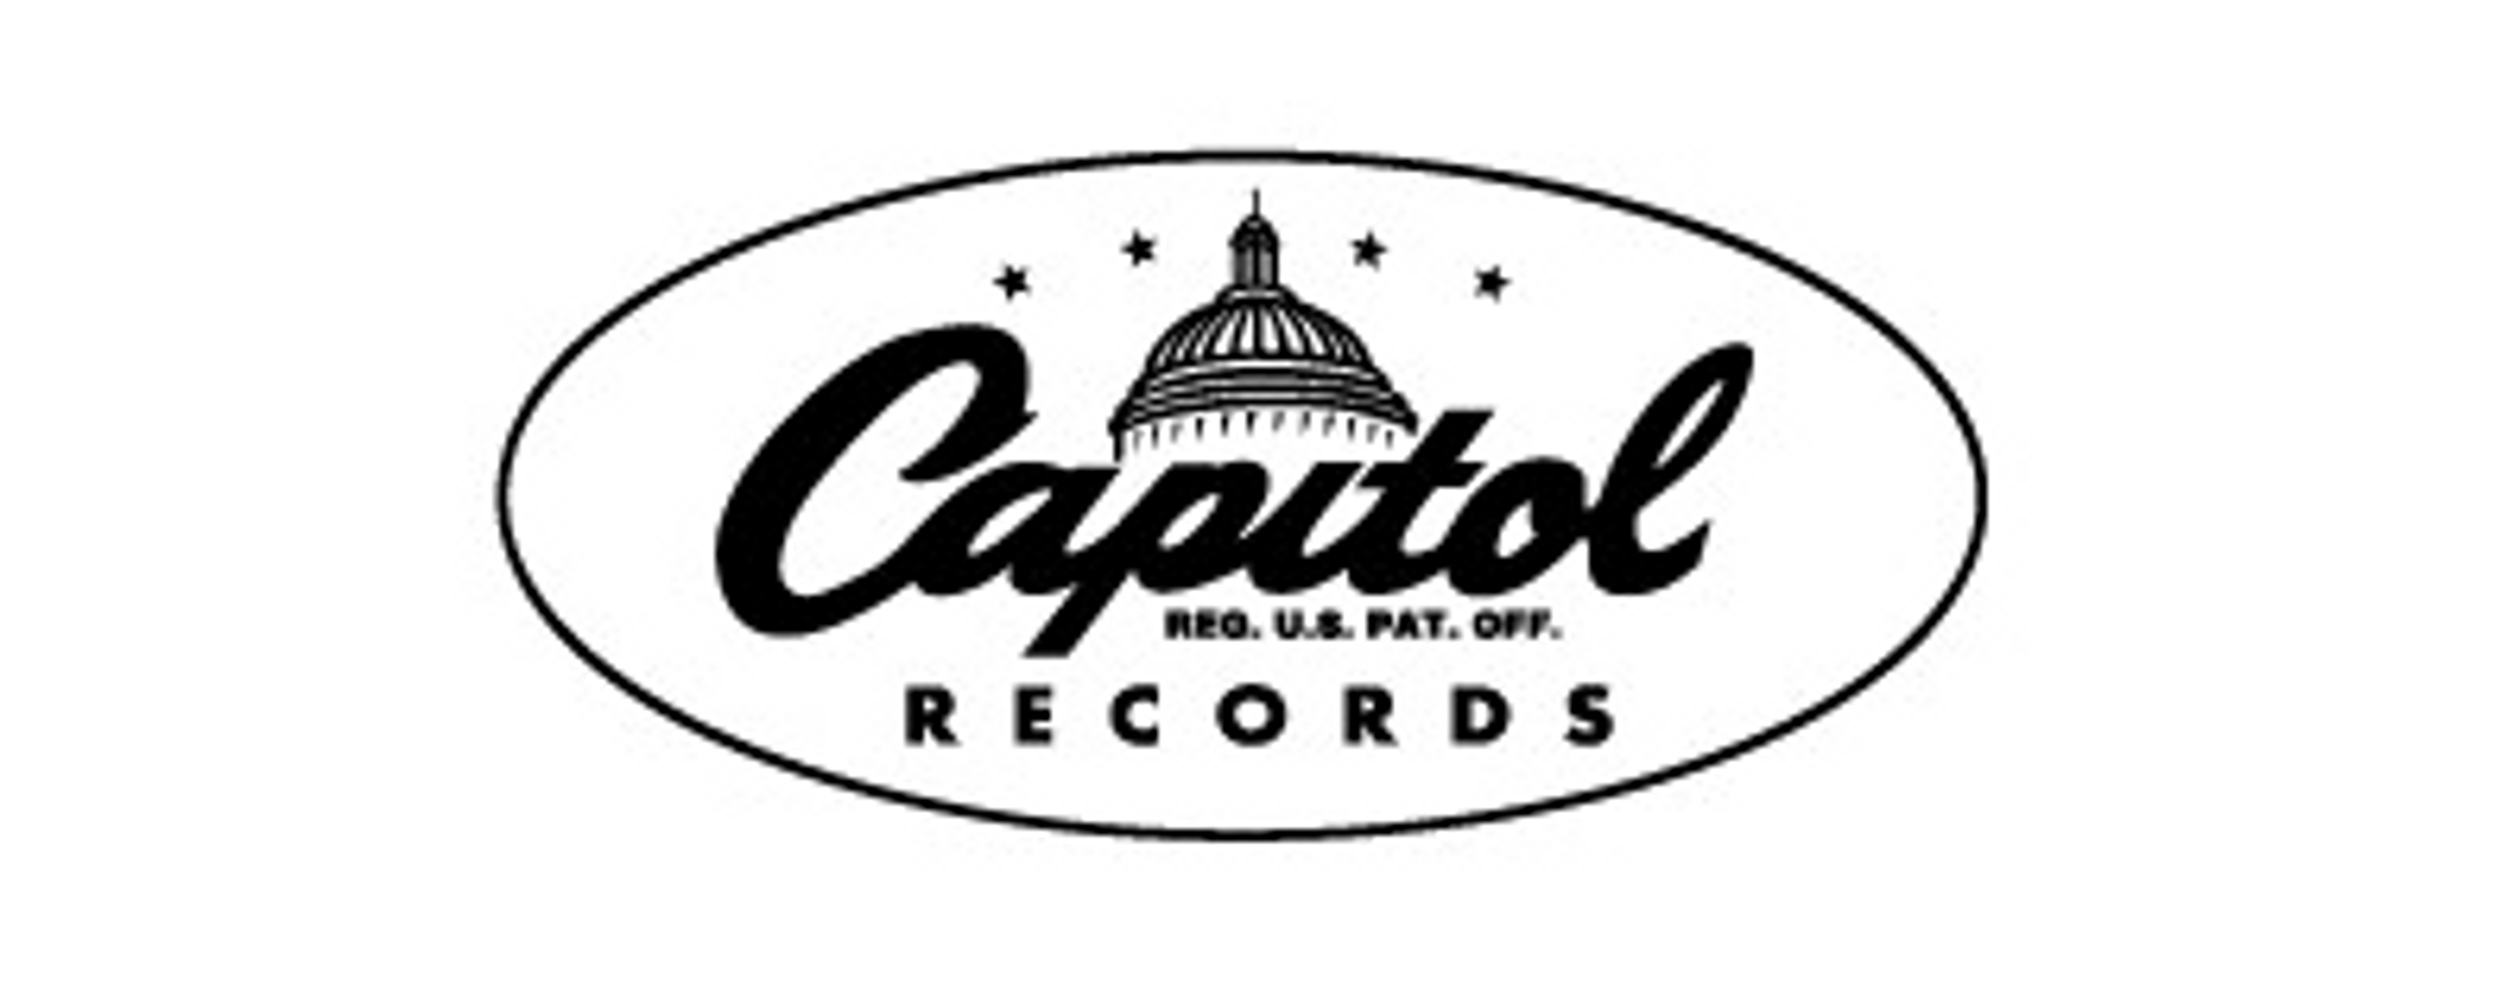 Capitol_Records_wikipedia_logo_duran_duran.jpg